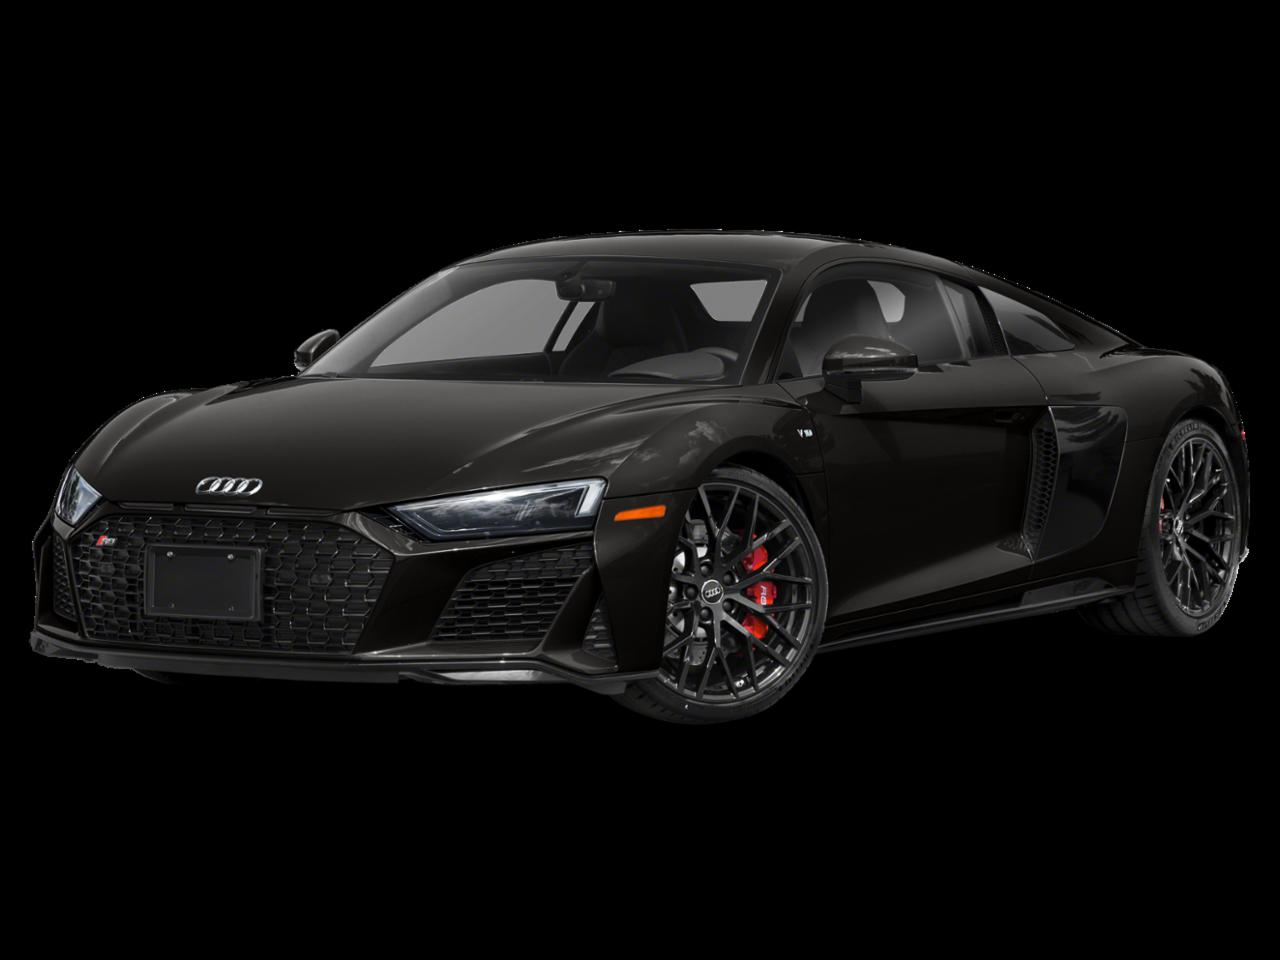 Audi 2021 R8 Coupe V10